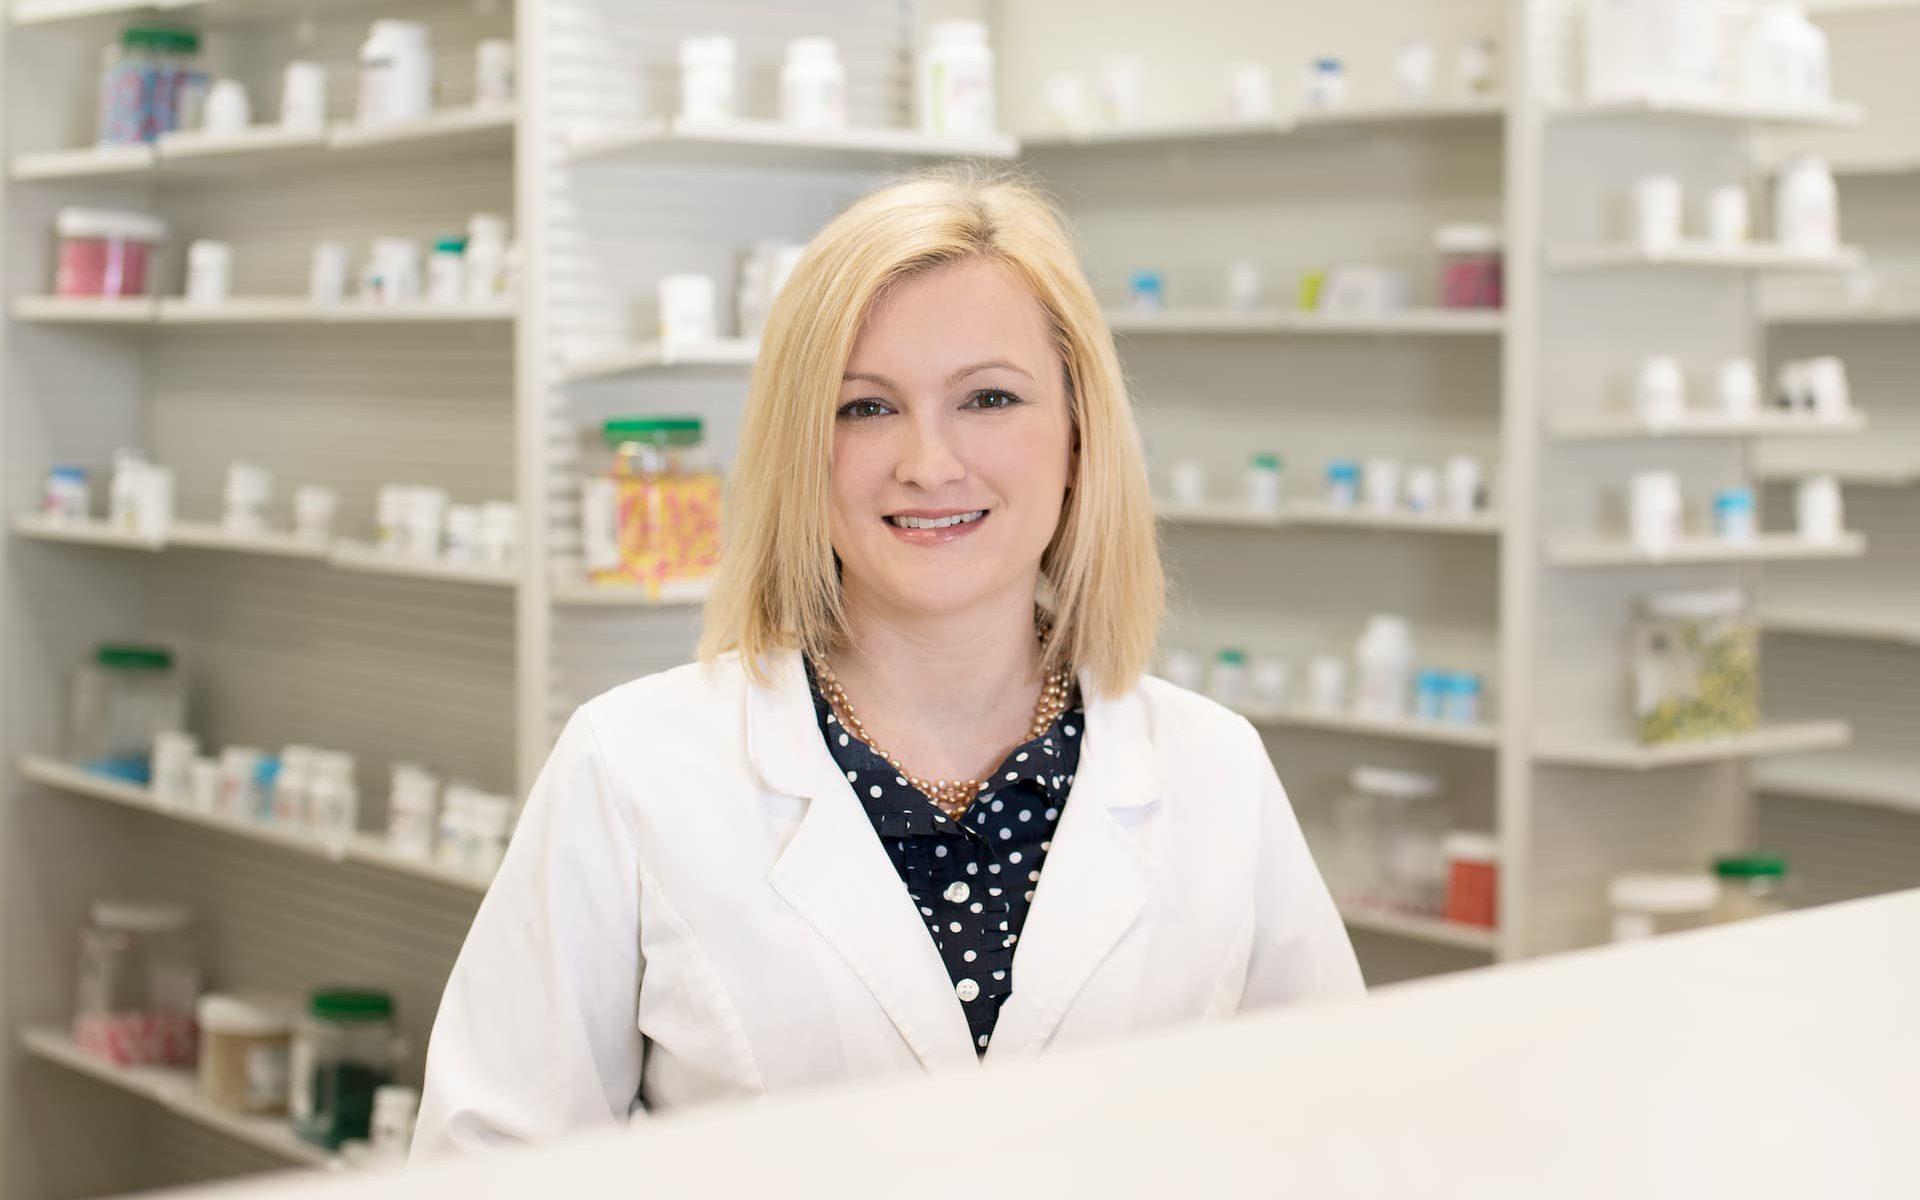 A headshot of Leah B. Argie inside the pharmacy